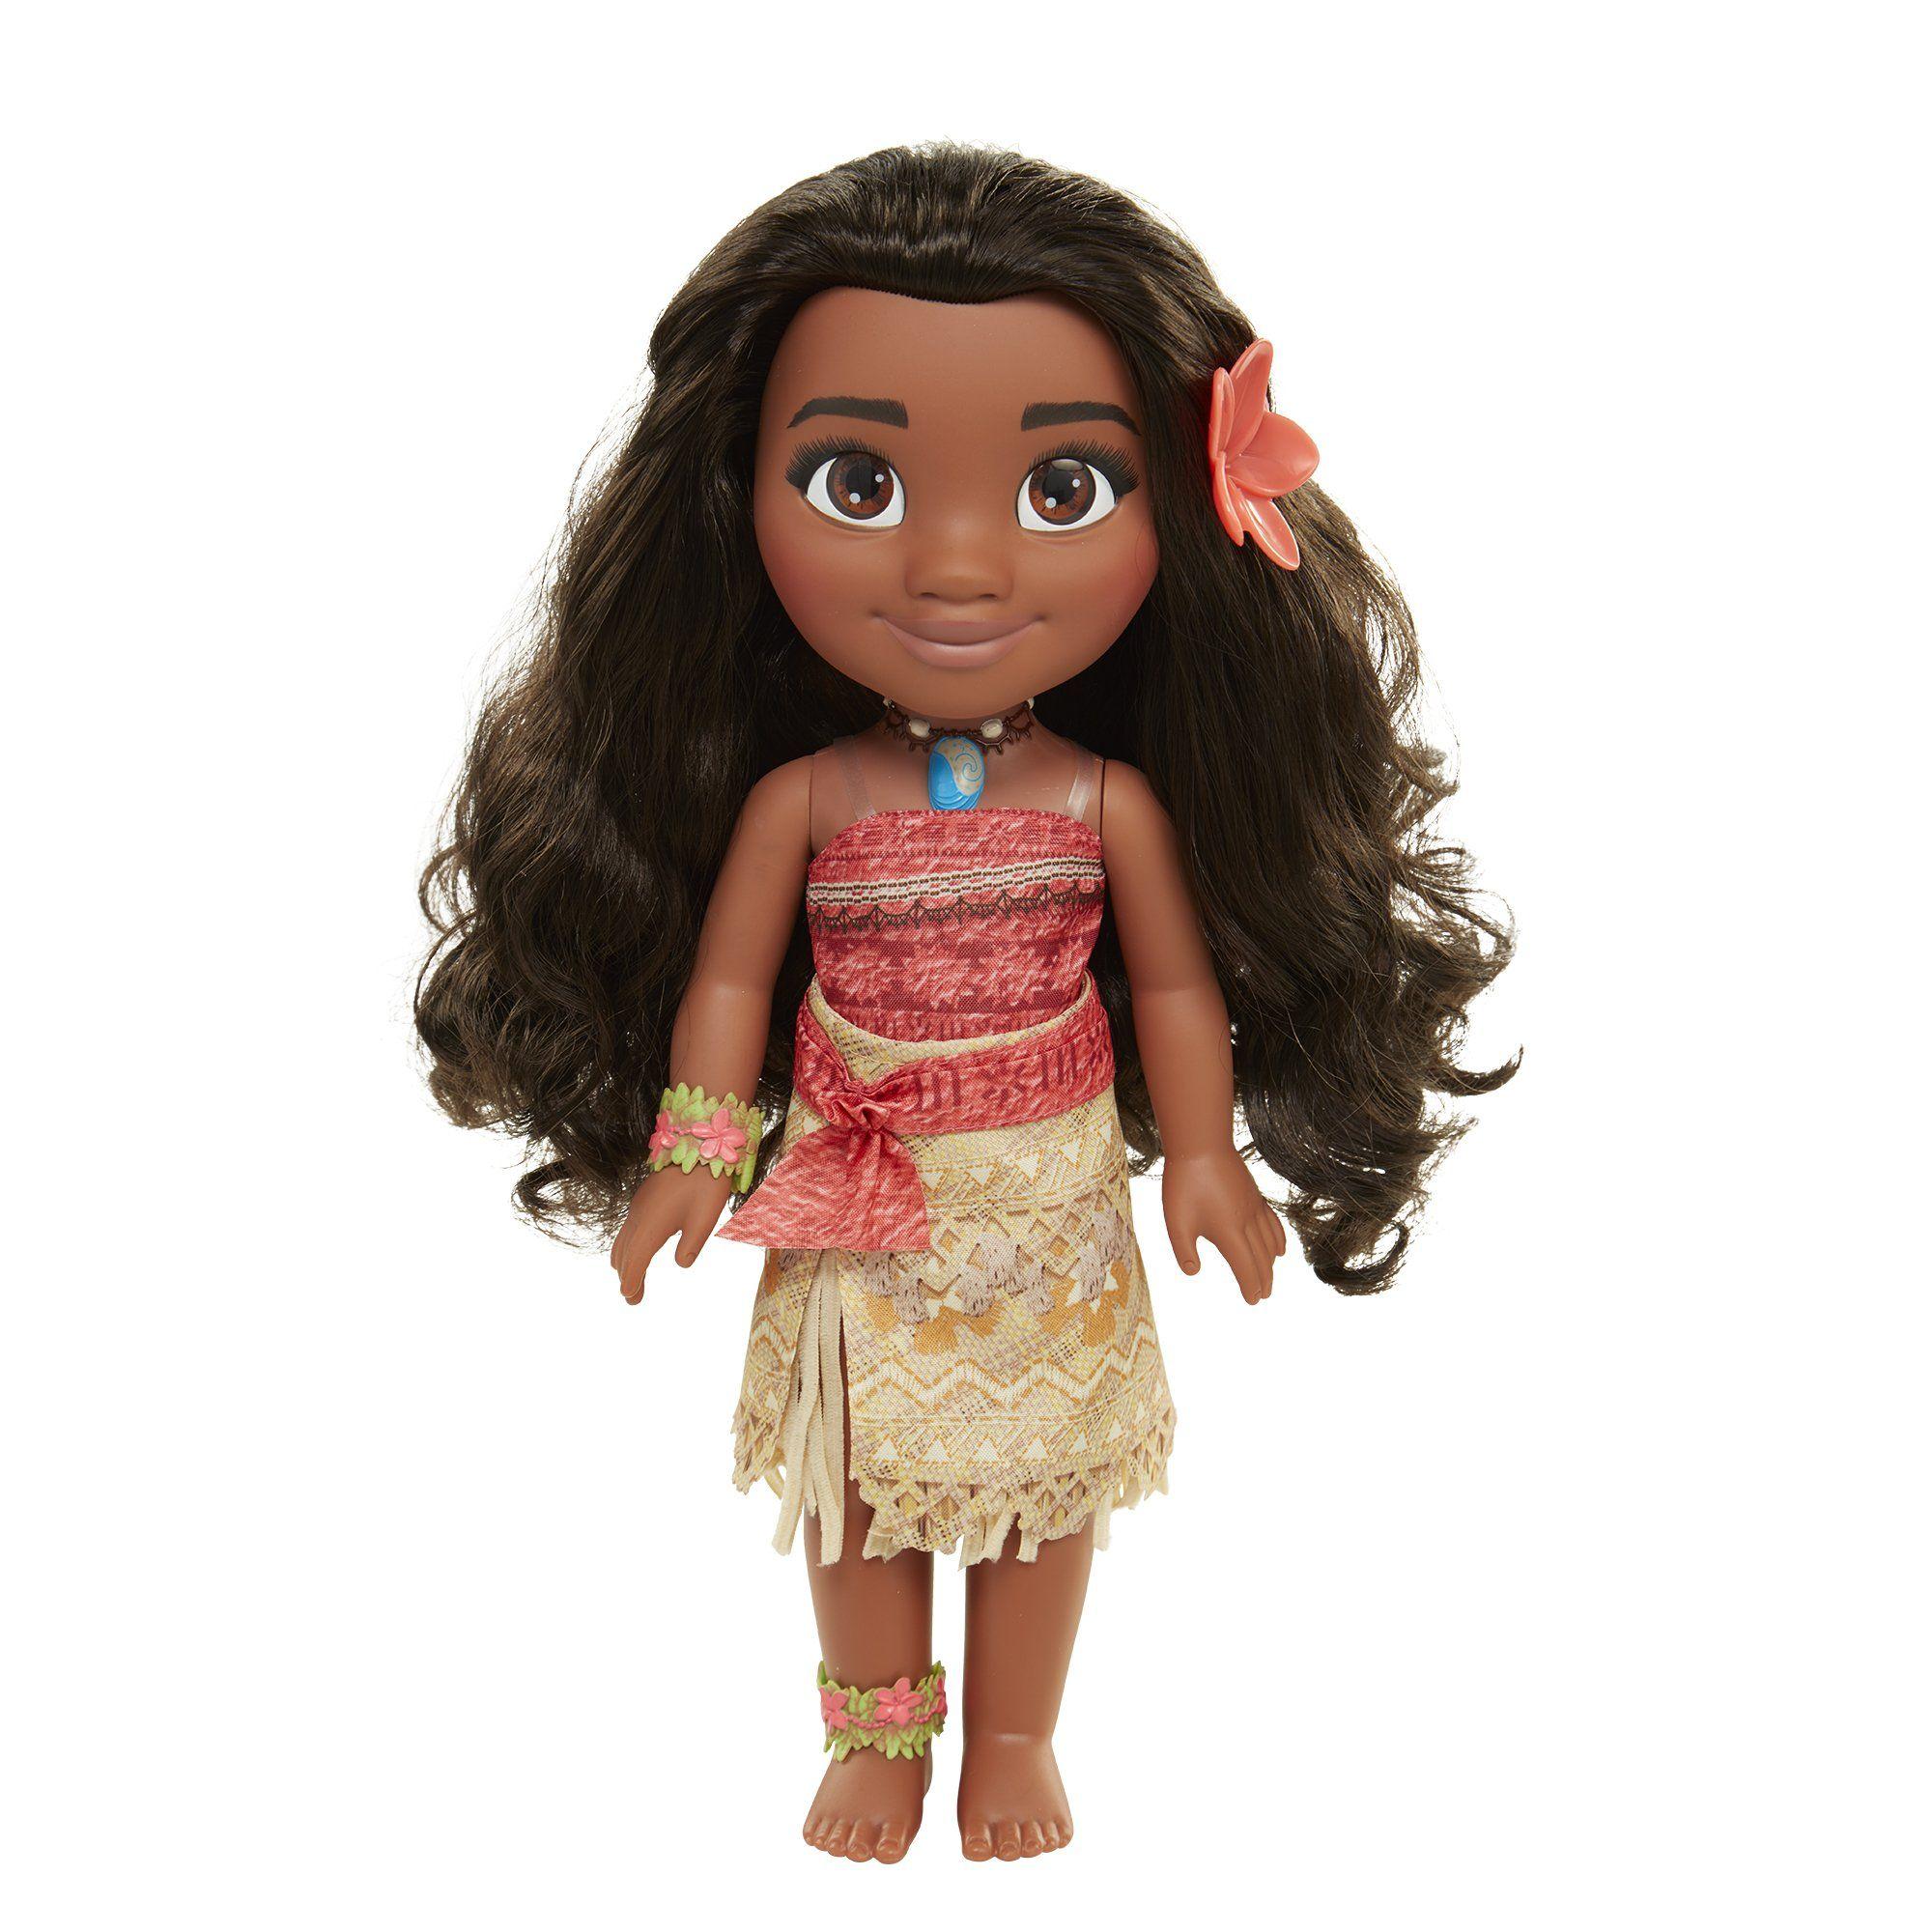 Amazon Com Disney Moana Adventure Doll 14 Inches Toys Games